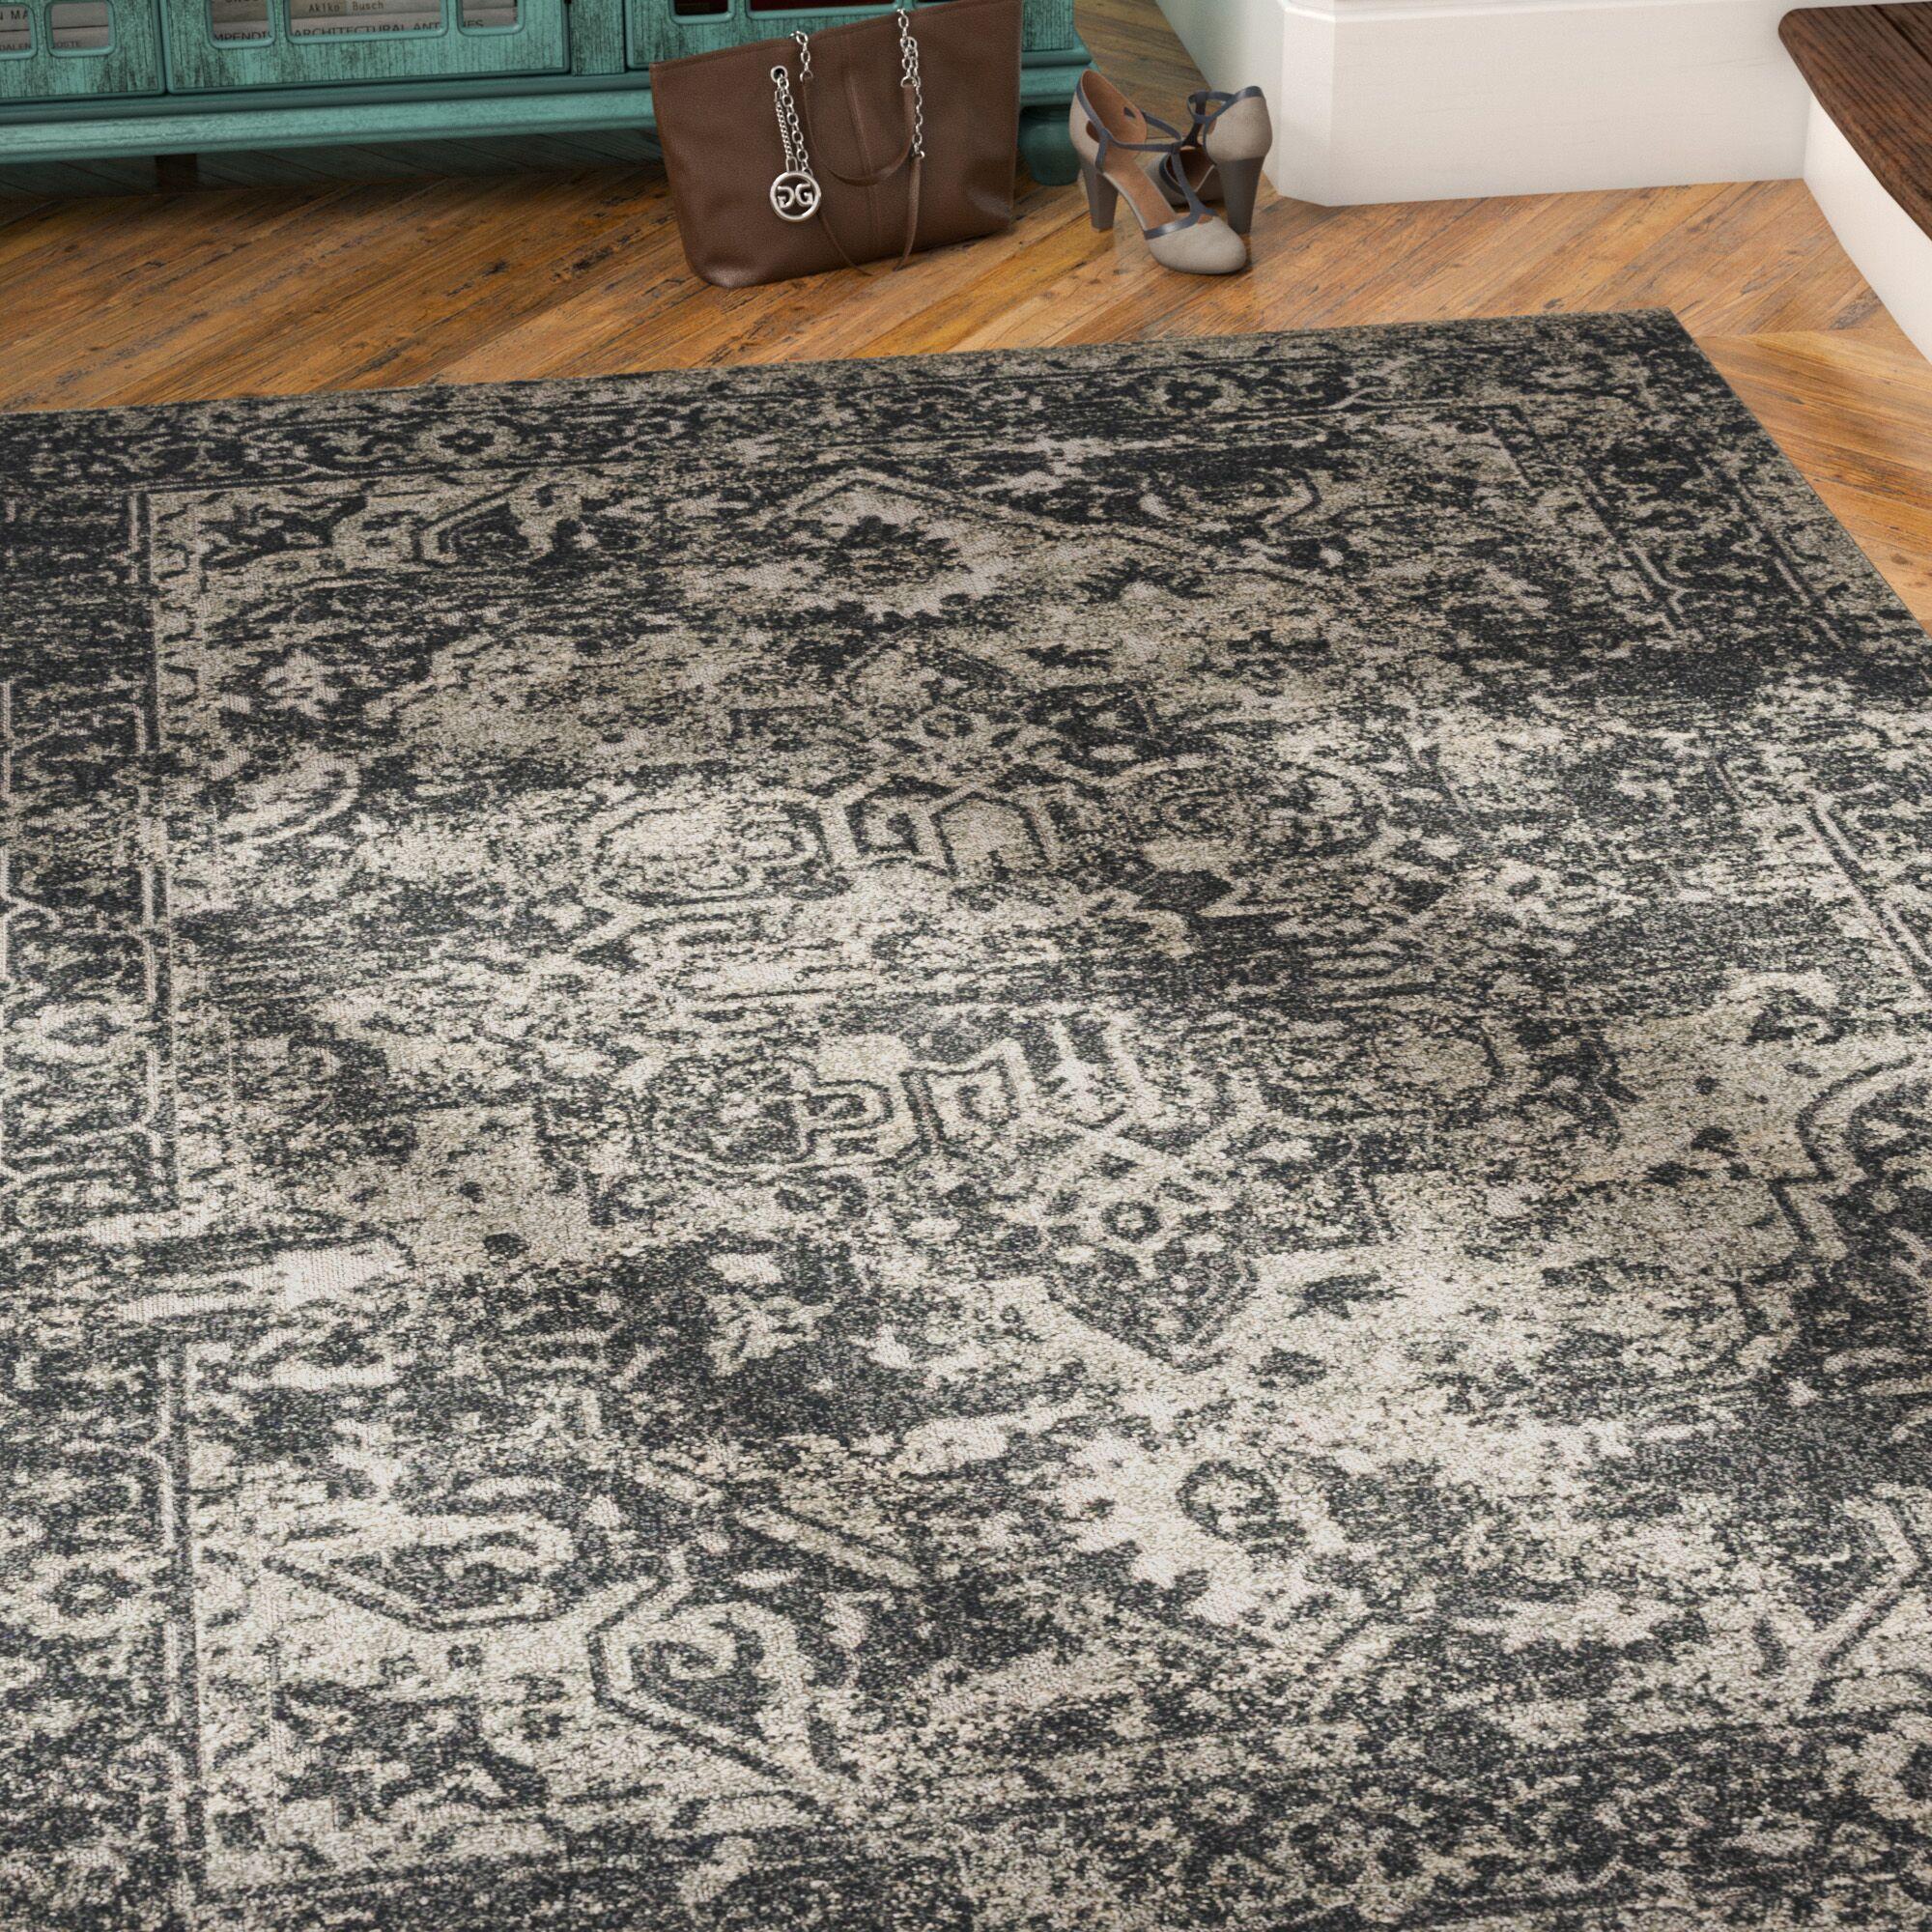 Angus Black/Khaki Indoor/Outdoor Area Rug Rug Size: Rectangle 5'3